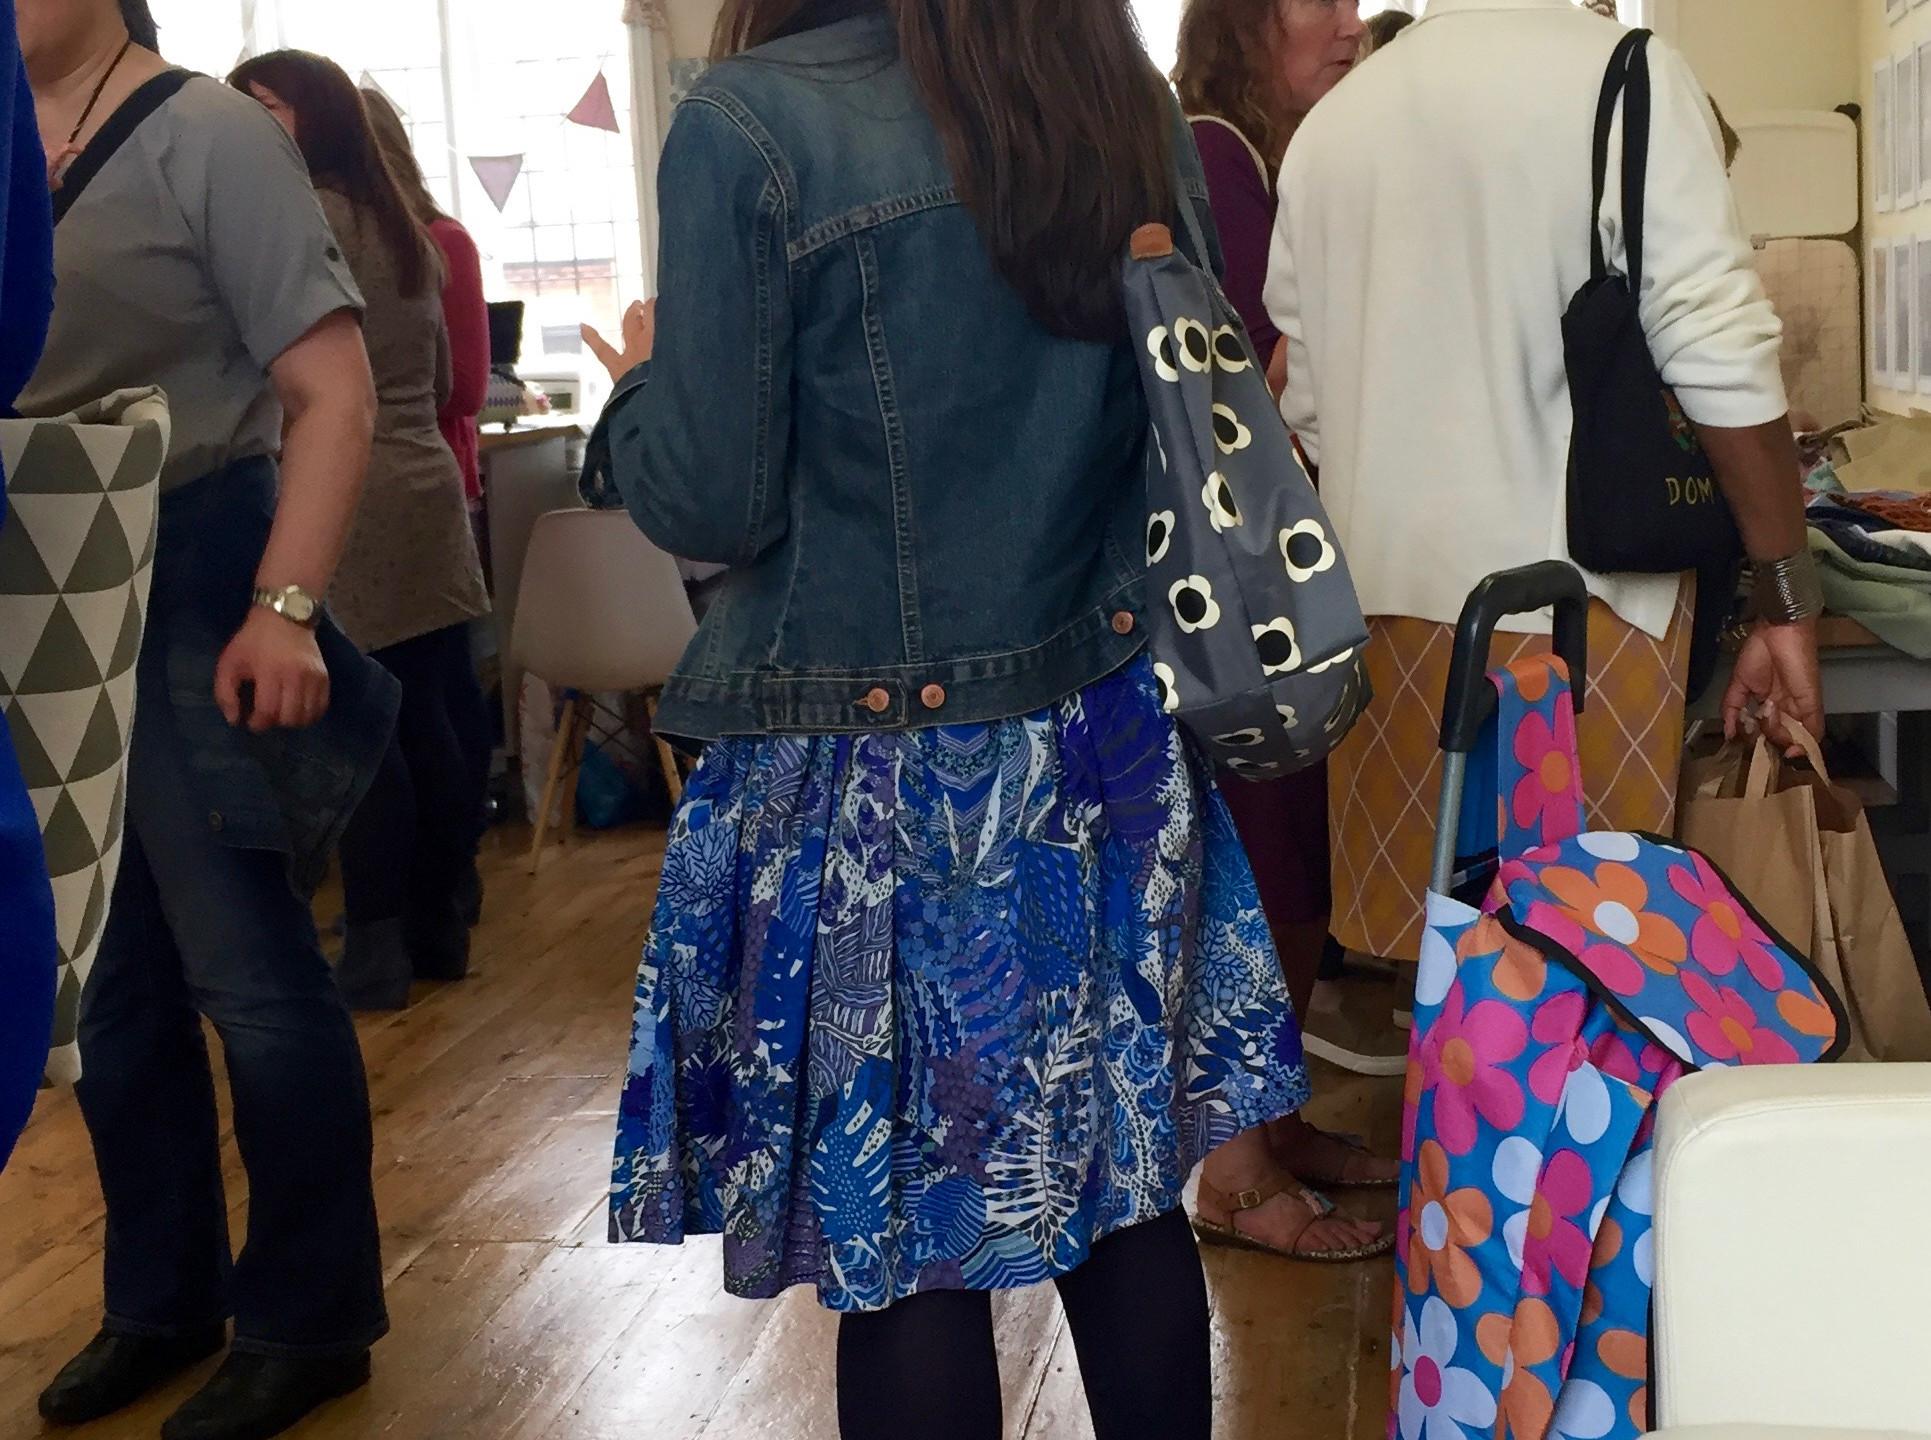 Great skirt. Liberty?